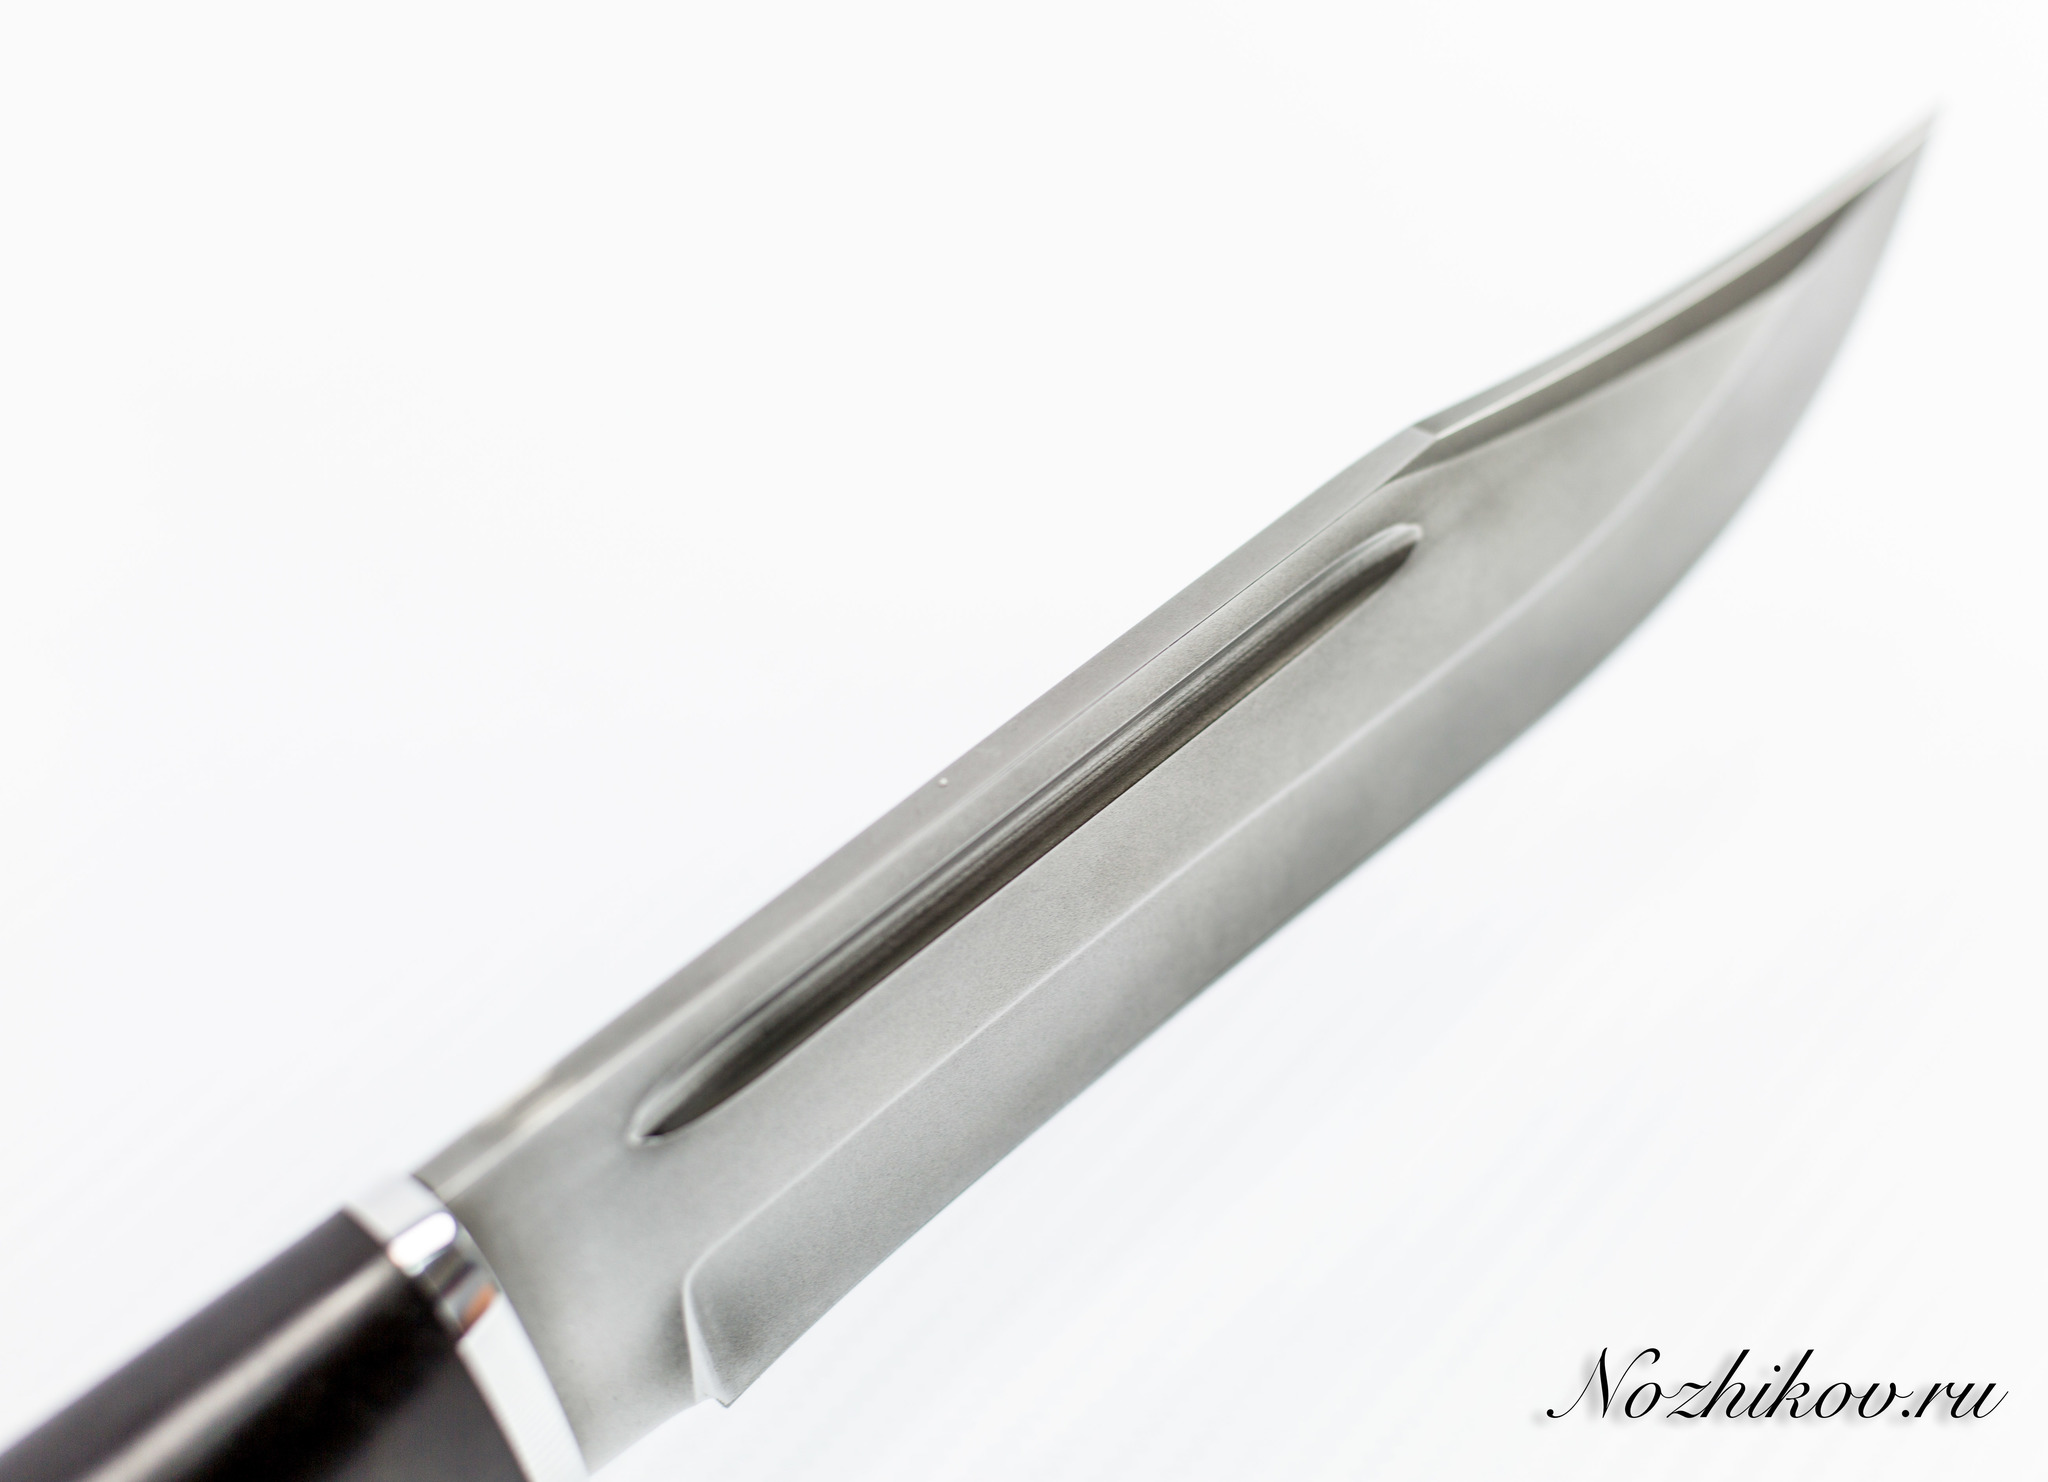 Нож Пустынный орел кованый Х12МФ, граб